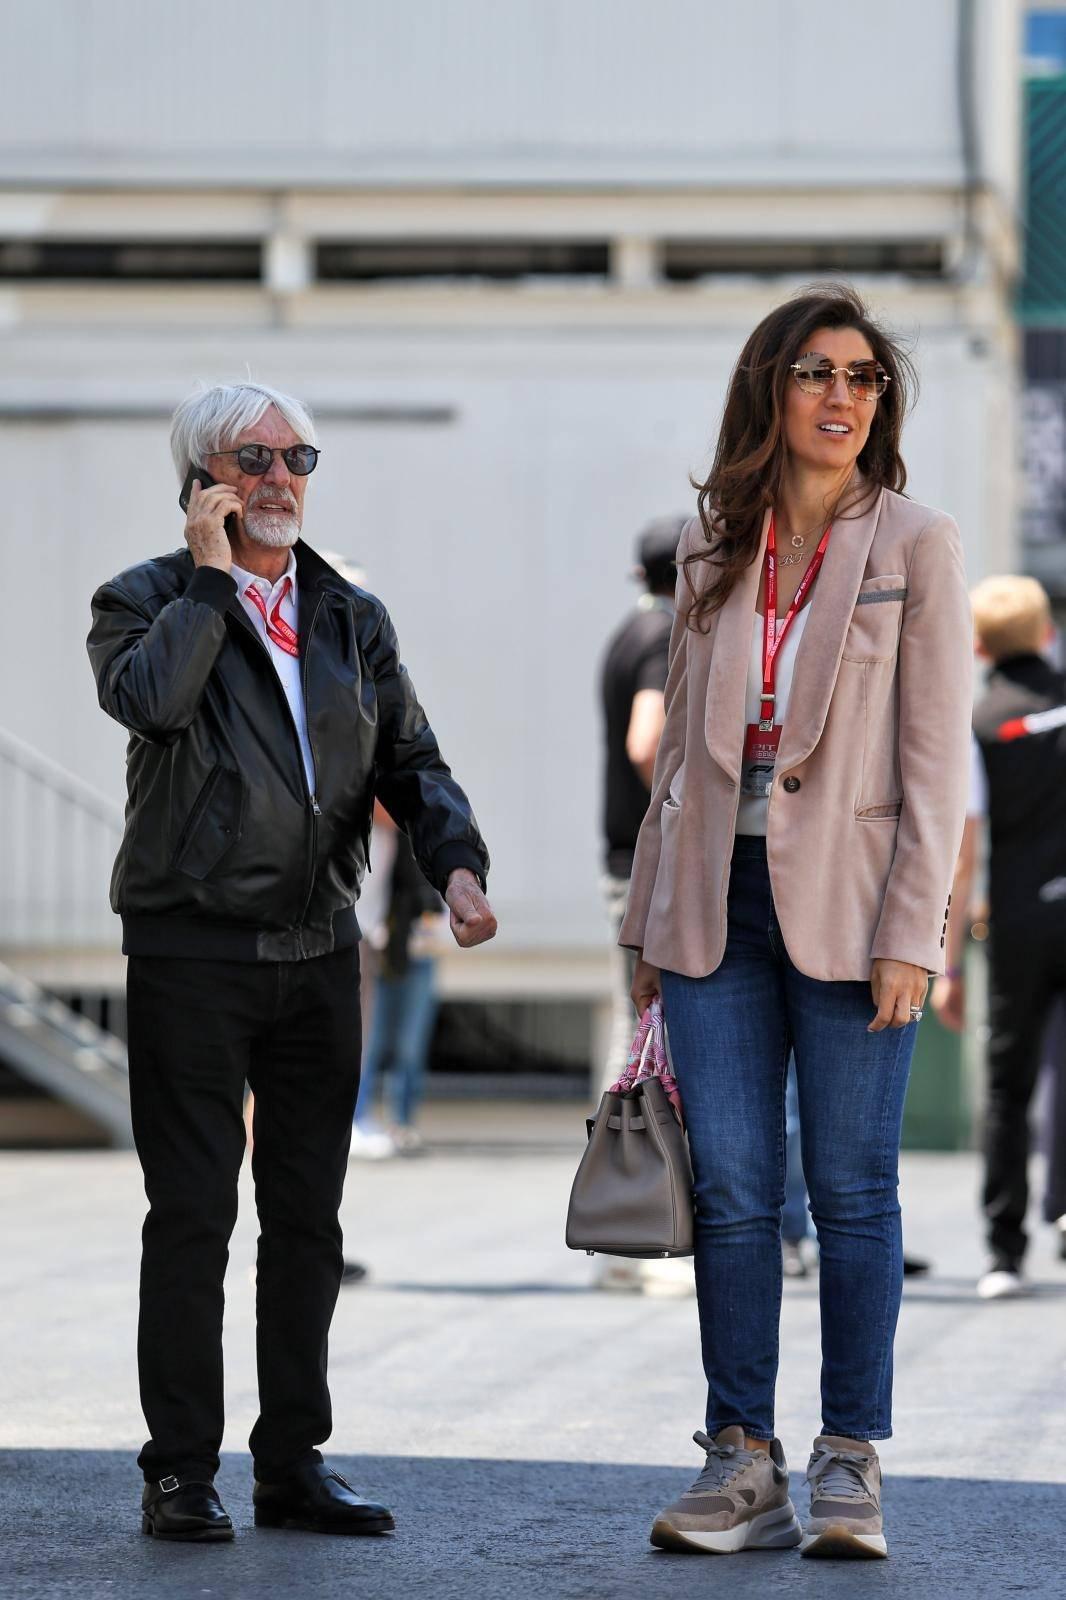 Azerbaijan Grand Prix - Qualifying - Baku City Circuit